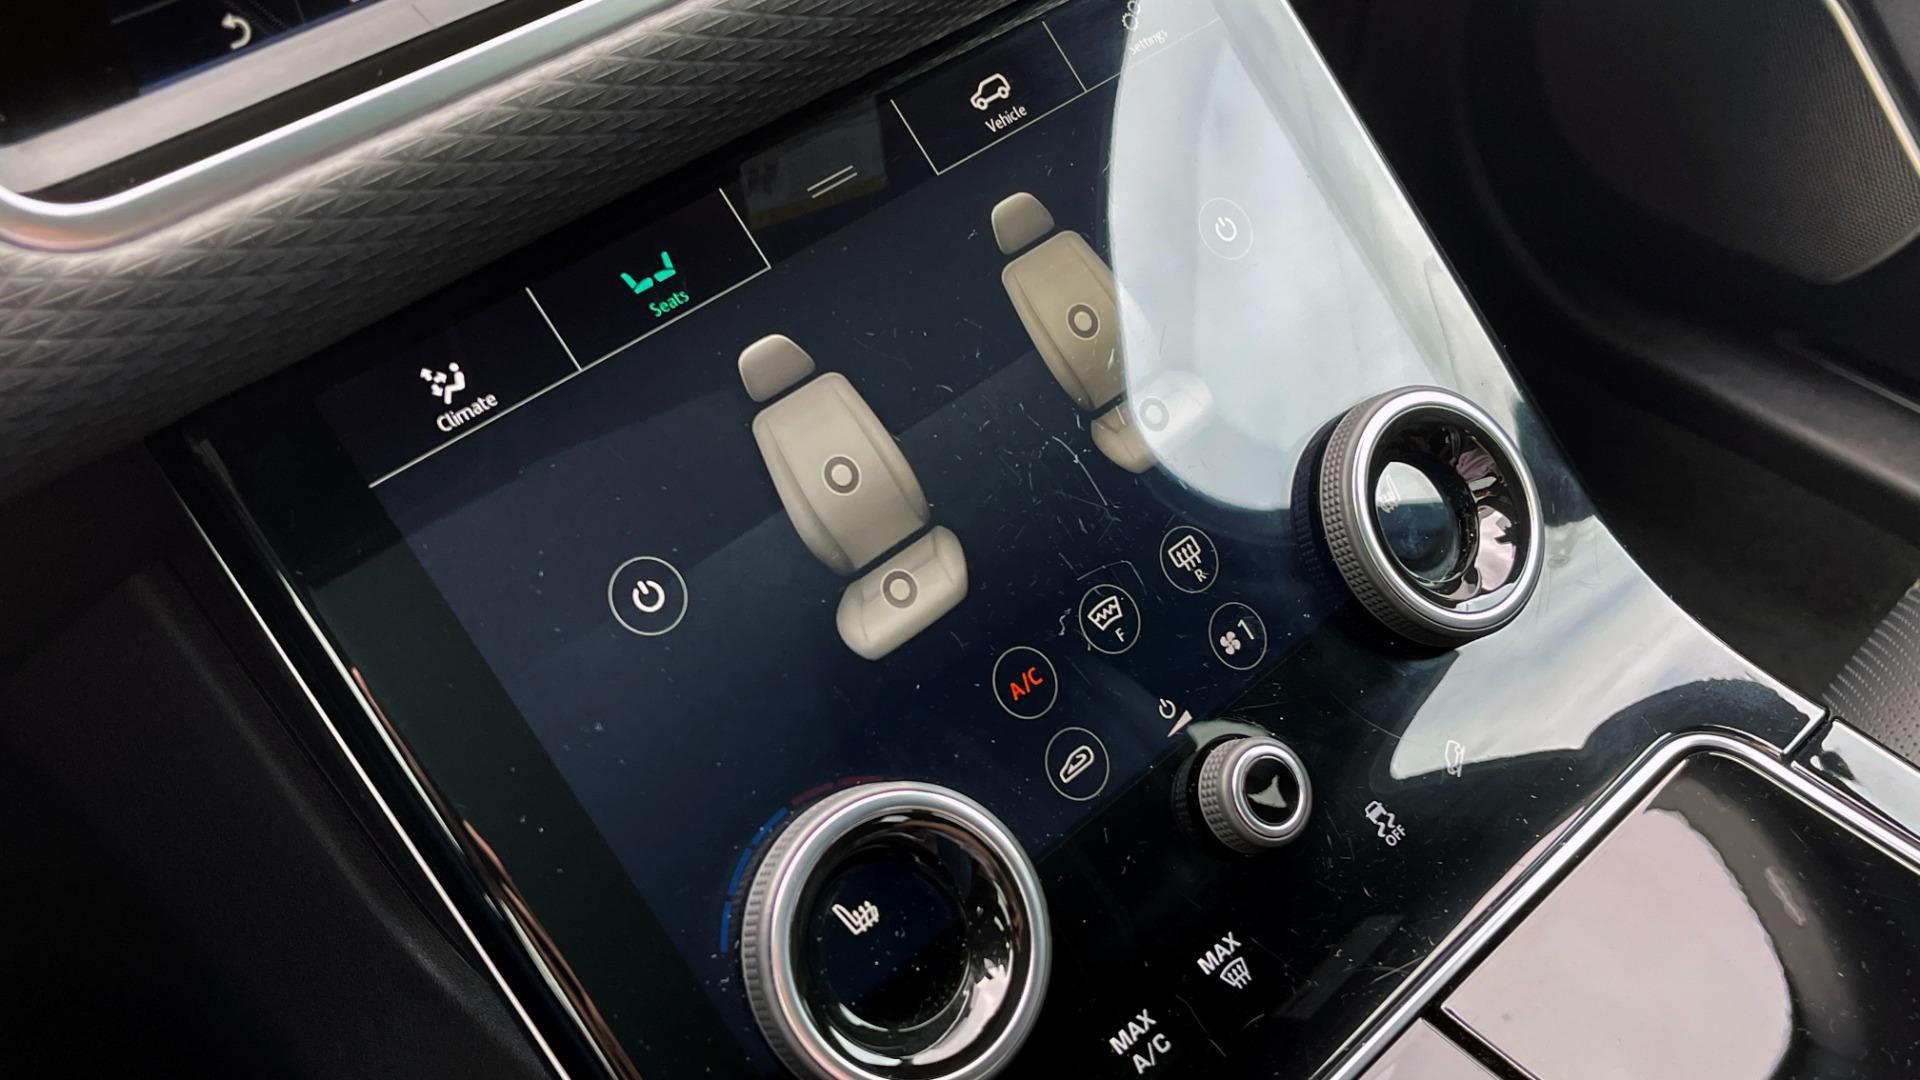 Used 2018 Land Rover RANGE ROVER VELAR R-DYNAMIC SE / NAV / PREM / MERIDIAN / SUNROOF / REARVIEW for sale $54,995 at Formula Imports in Charlotte NC 28227 44